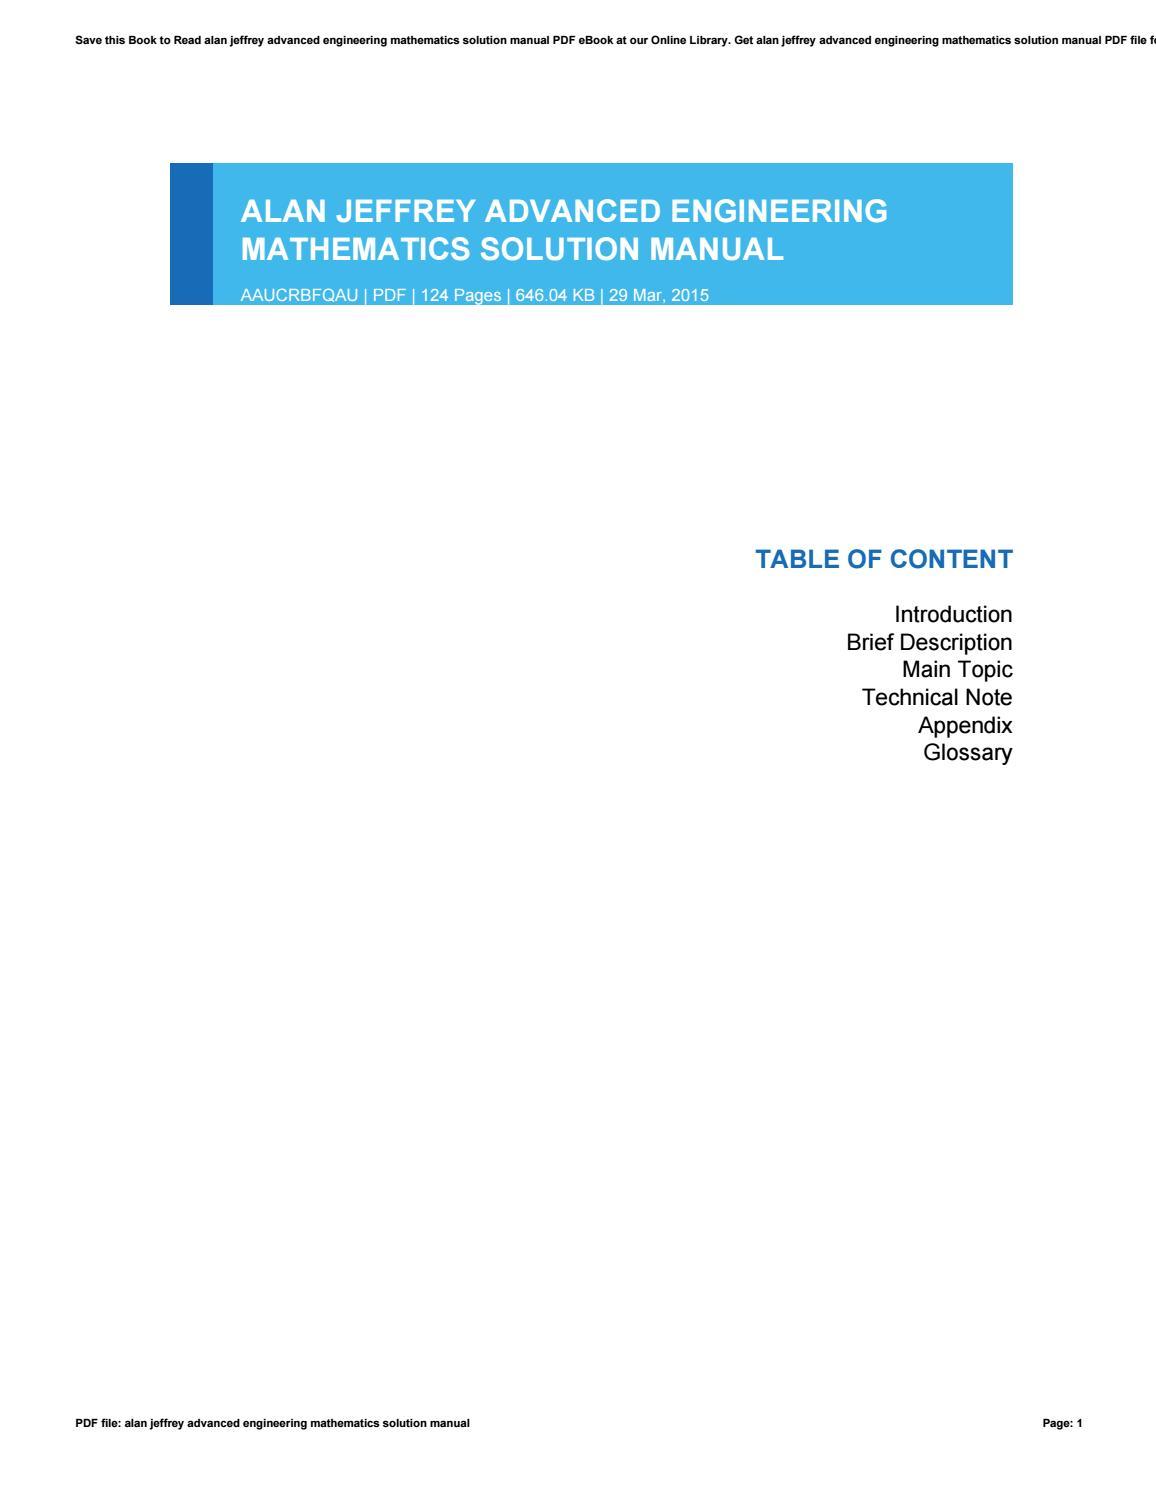 Alan jeffrey advanced engineering mathematics solution manual by  roler49ndisk - issuu